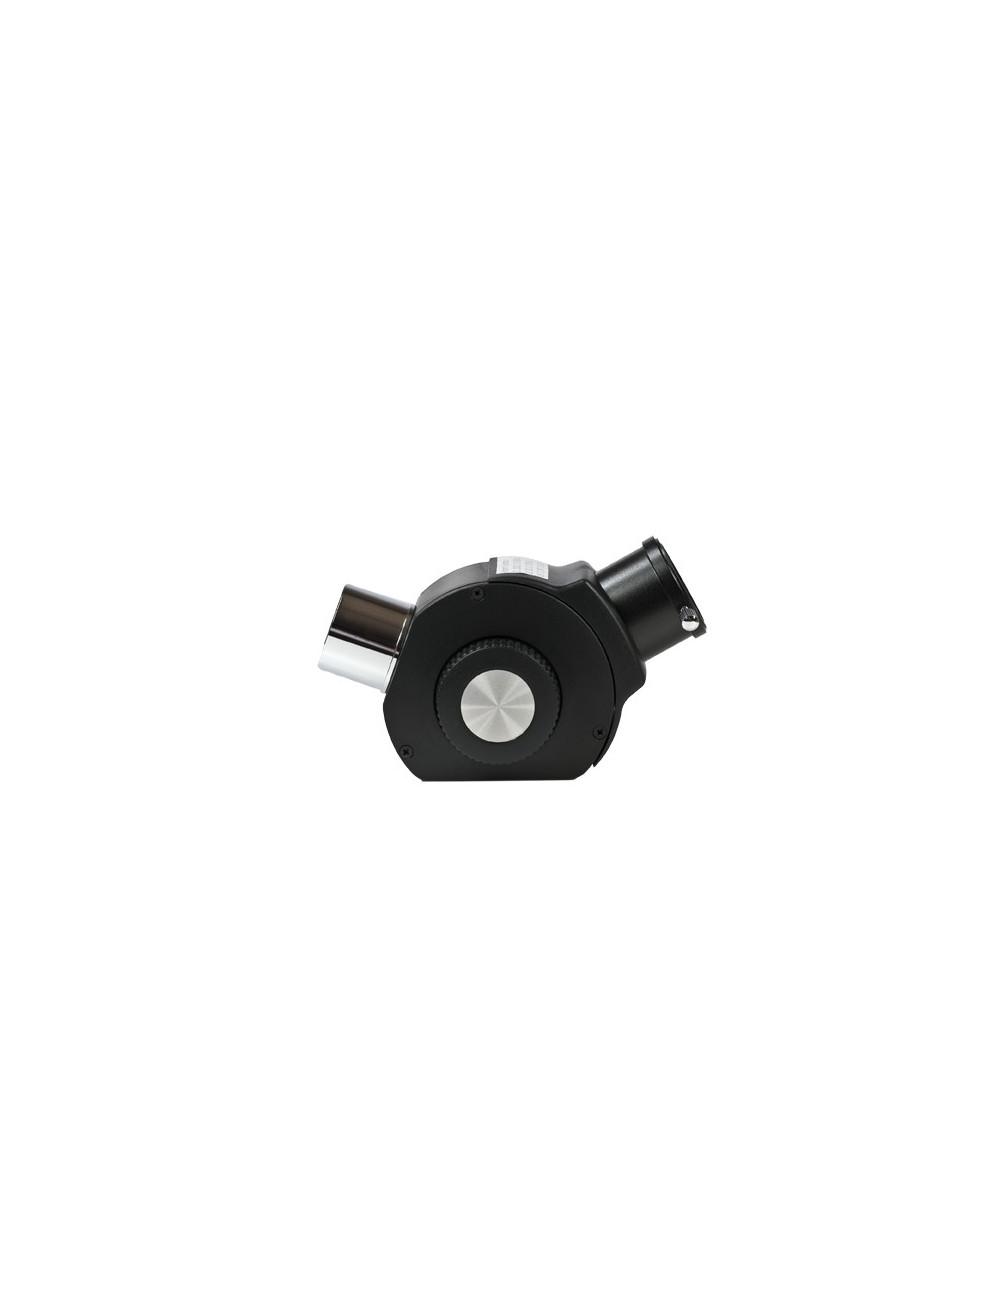 Renvoi coudé variable 45/90° Ø 31,75 mm